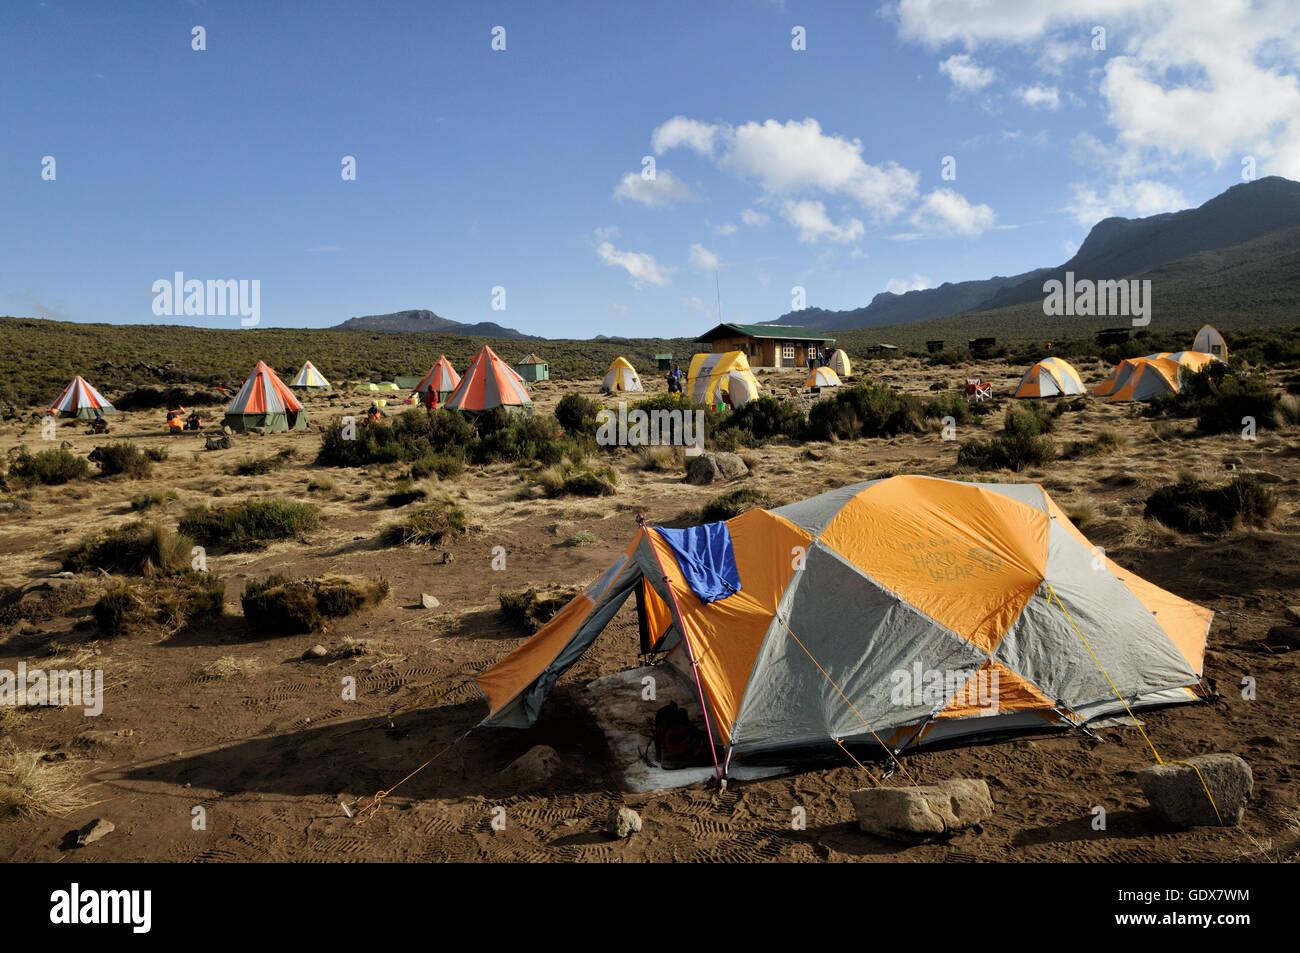 Tents at Shira 1 Camp on Lemosho route, Mount Kilimanjaro National Park, Tanzania Stock Photo